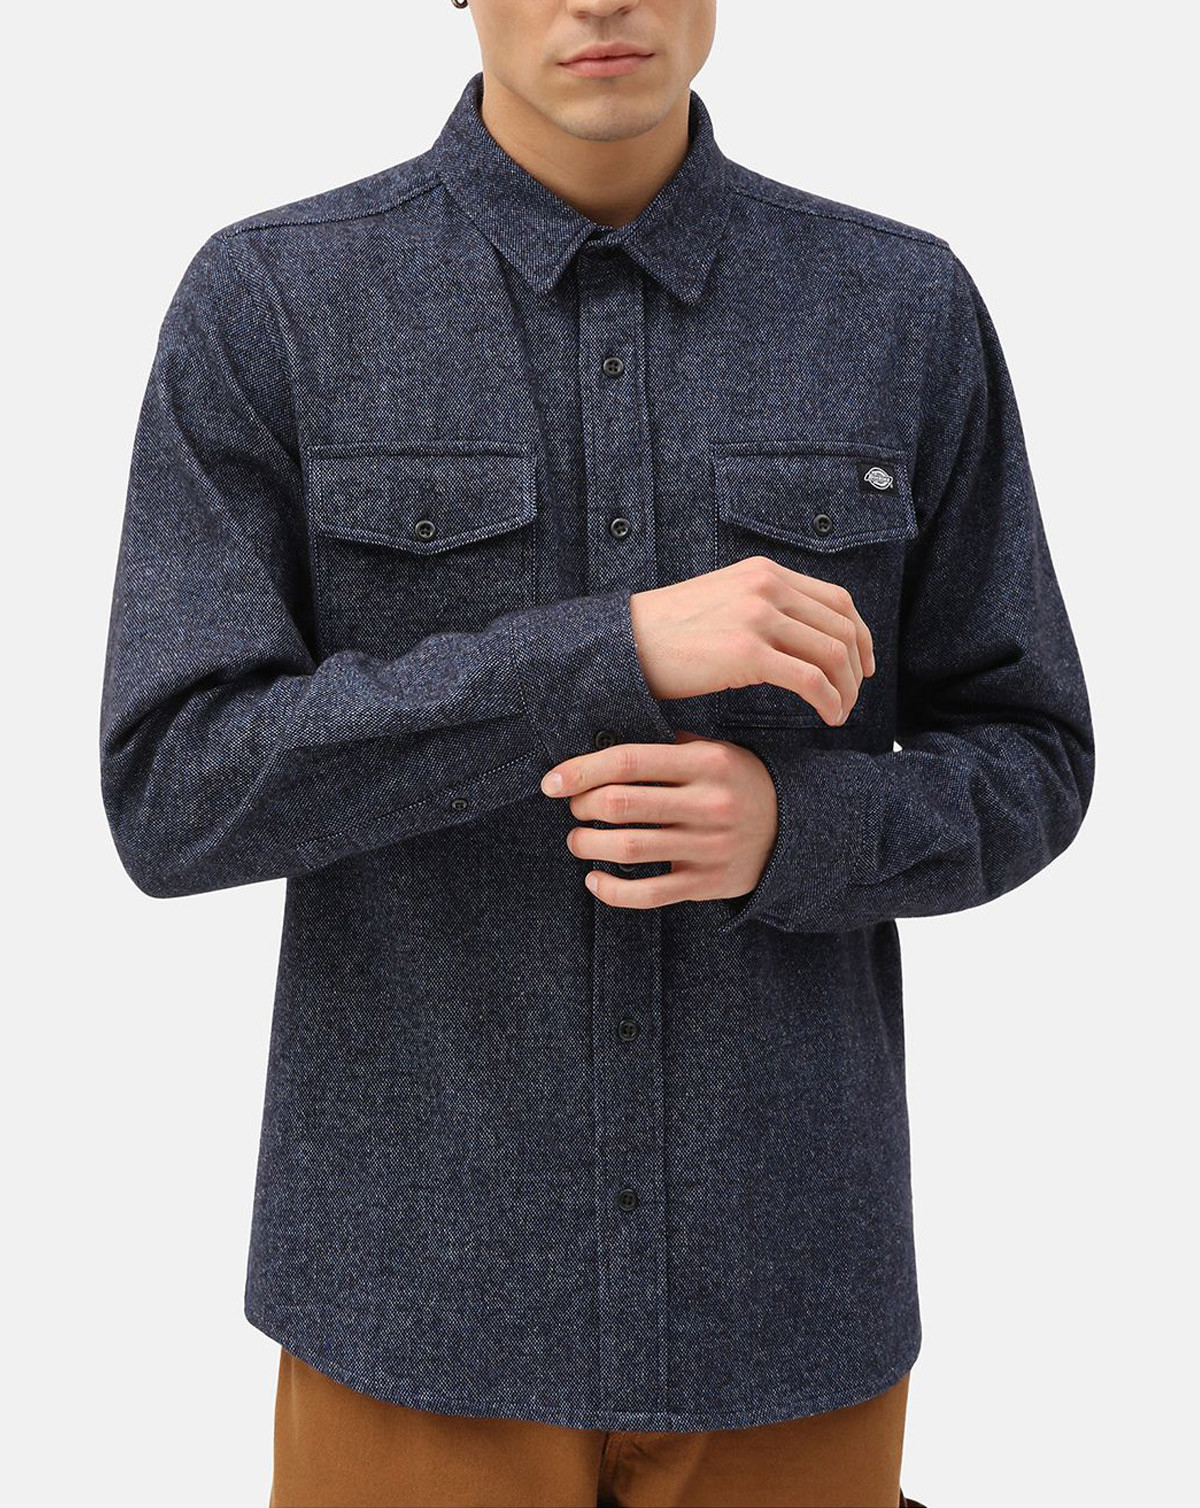 Dickies Woodmere Shirt (Dark Navy, XL)